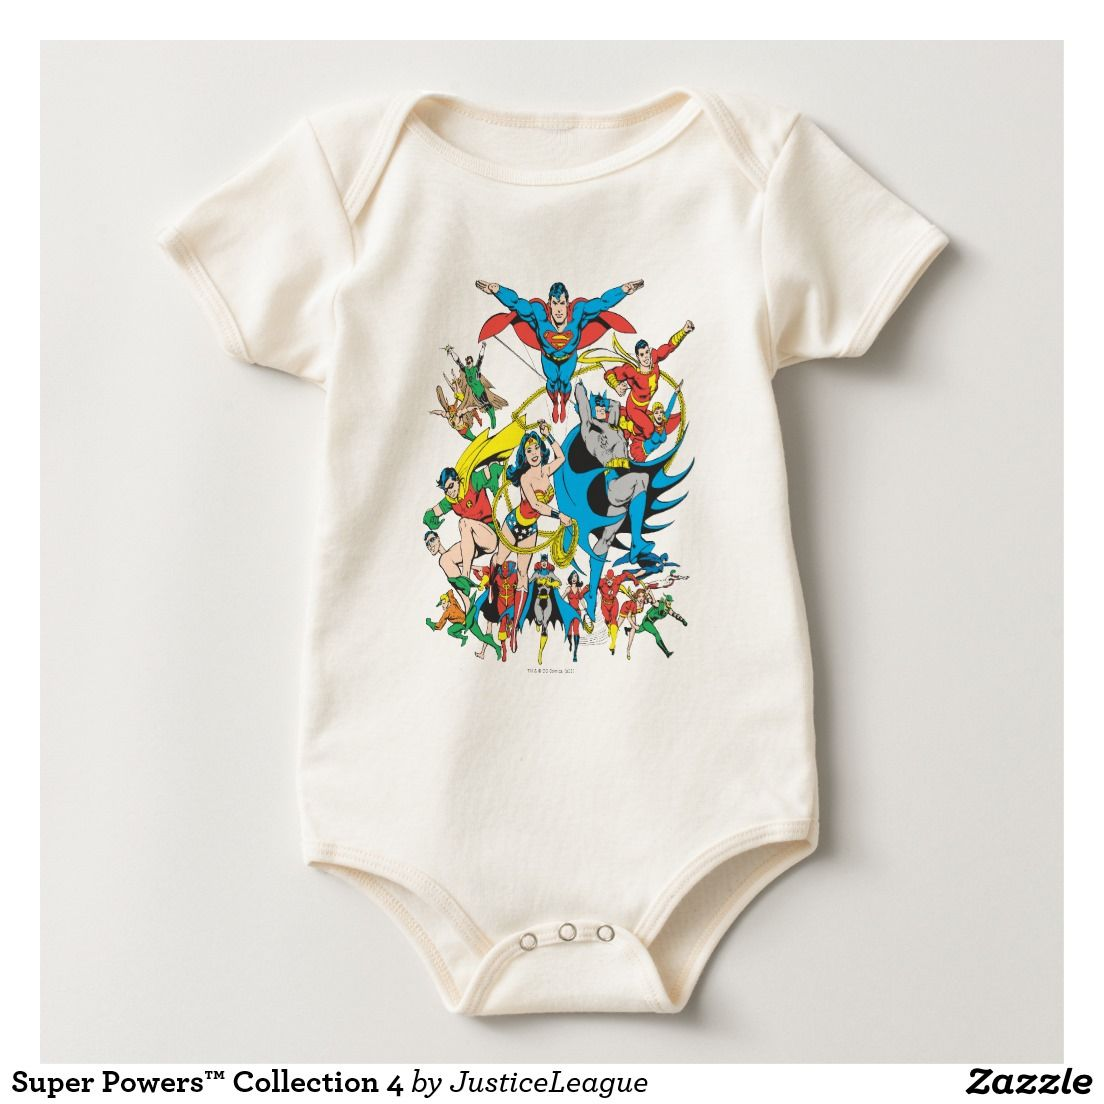 Your Custom Baby American Apparel Organic Bodysuit